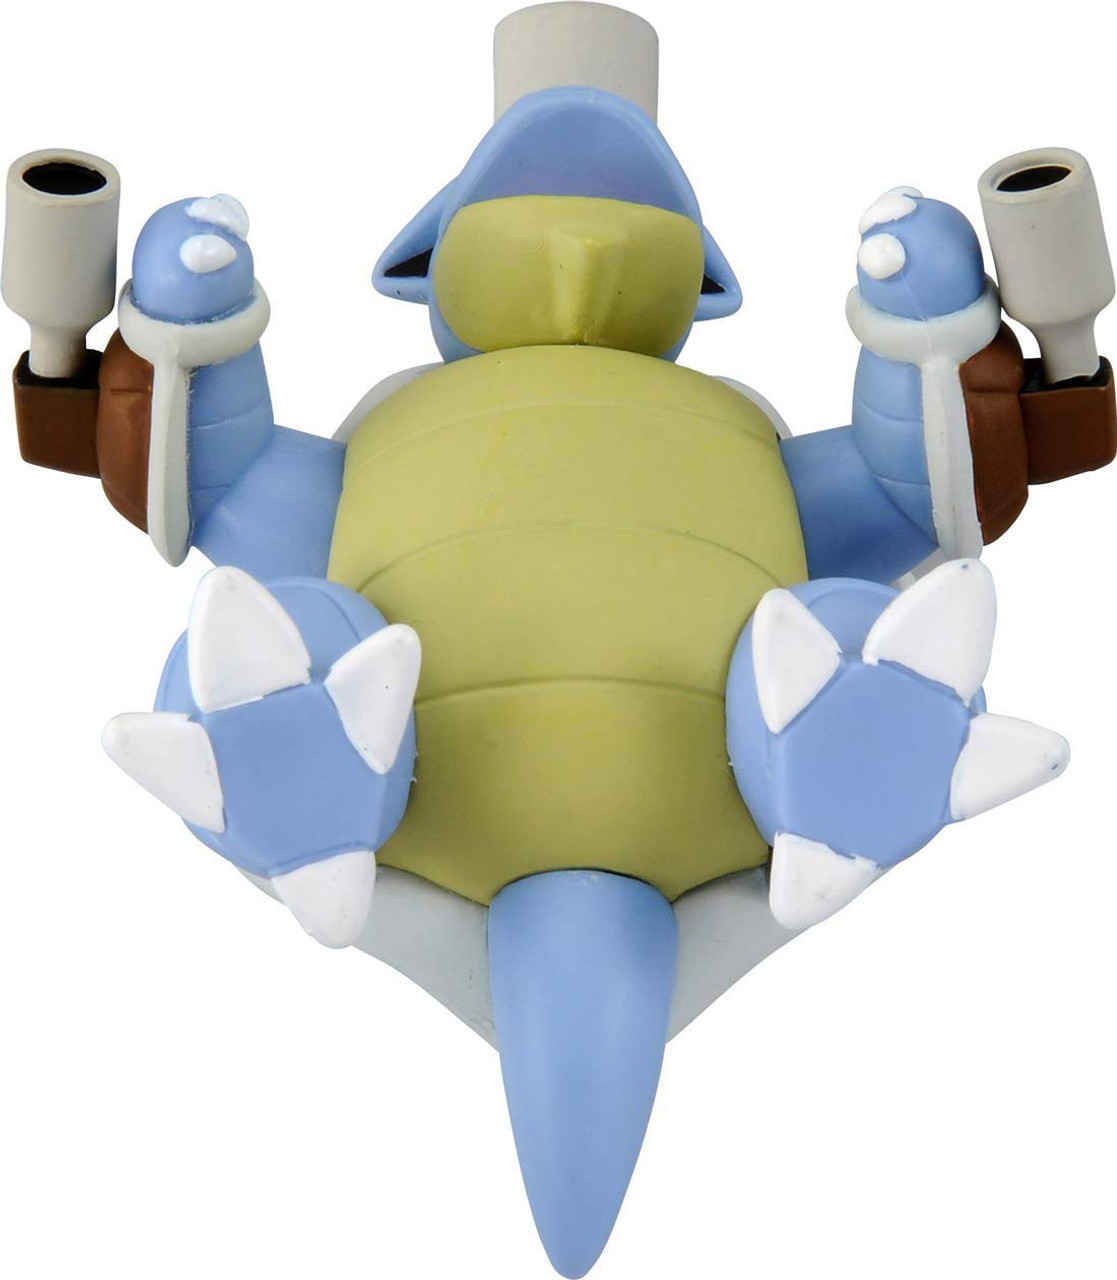 Takara Tomy Pokemon Moncolle EX ESP_14 Mega Blastoise Kamex Figure  Animation Art & Characters Japanese, Anime